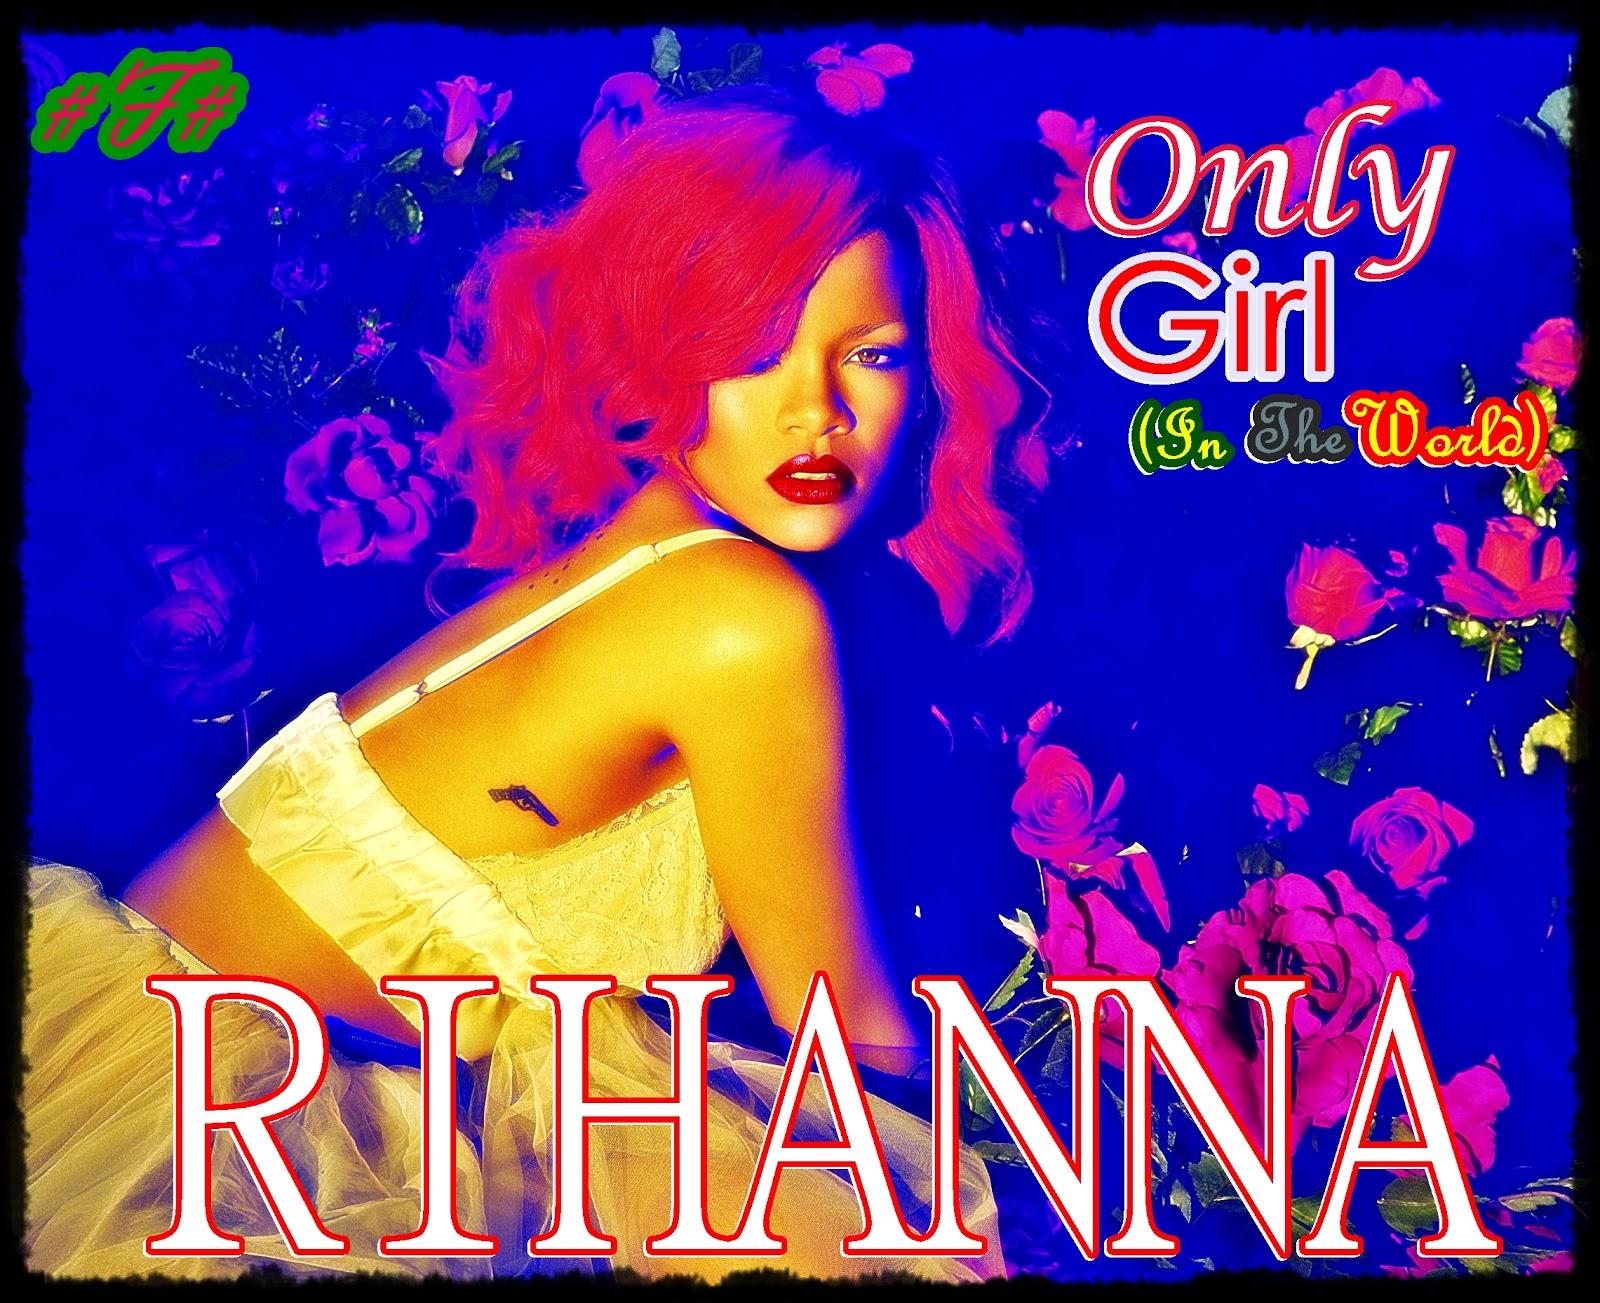 http://3.bp.blogspot.com/_GTQEn3ssFMo/TLktr5uO1MI/AAAAAAAAACA/4HGEio-k9aY/s1600/Rihanna.jpg